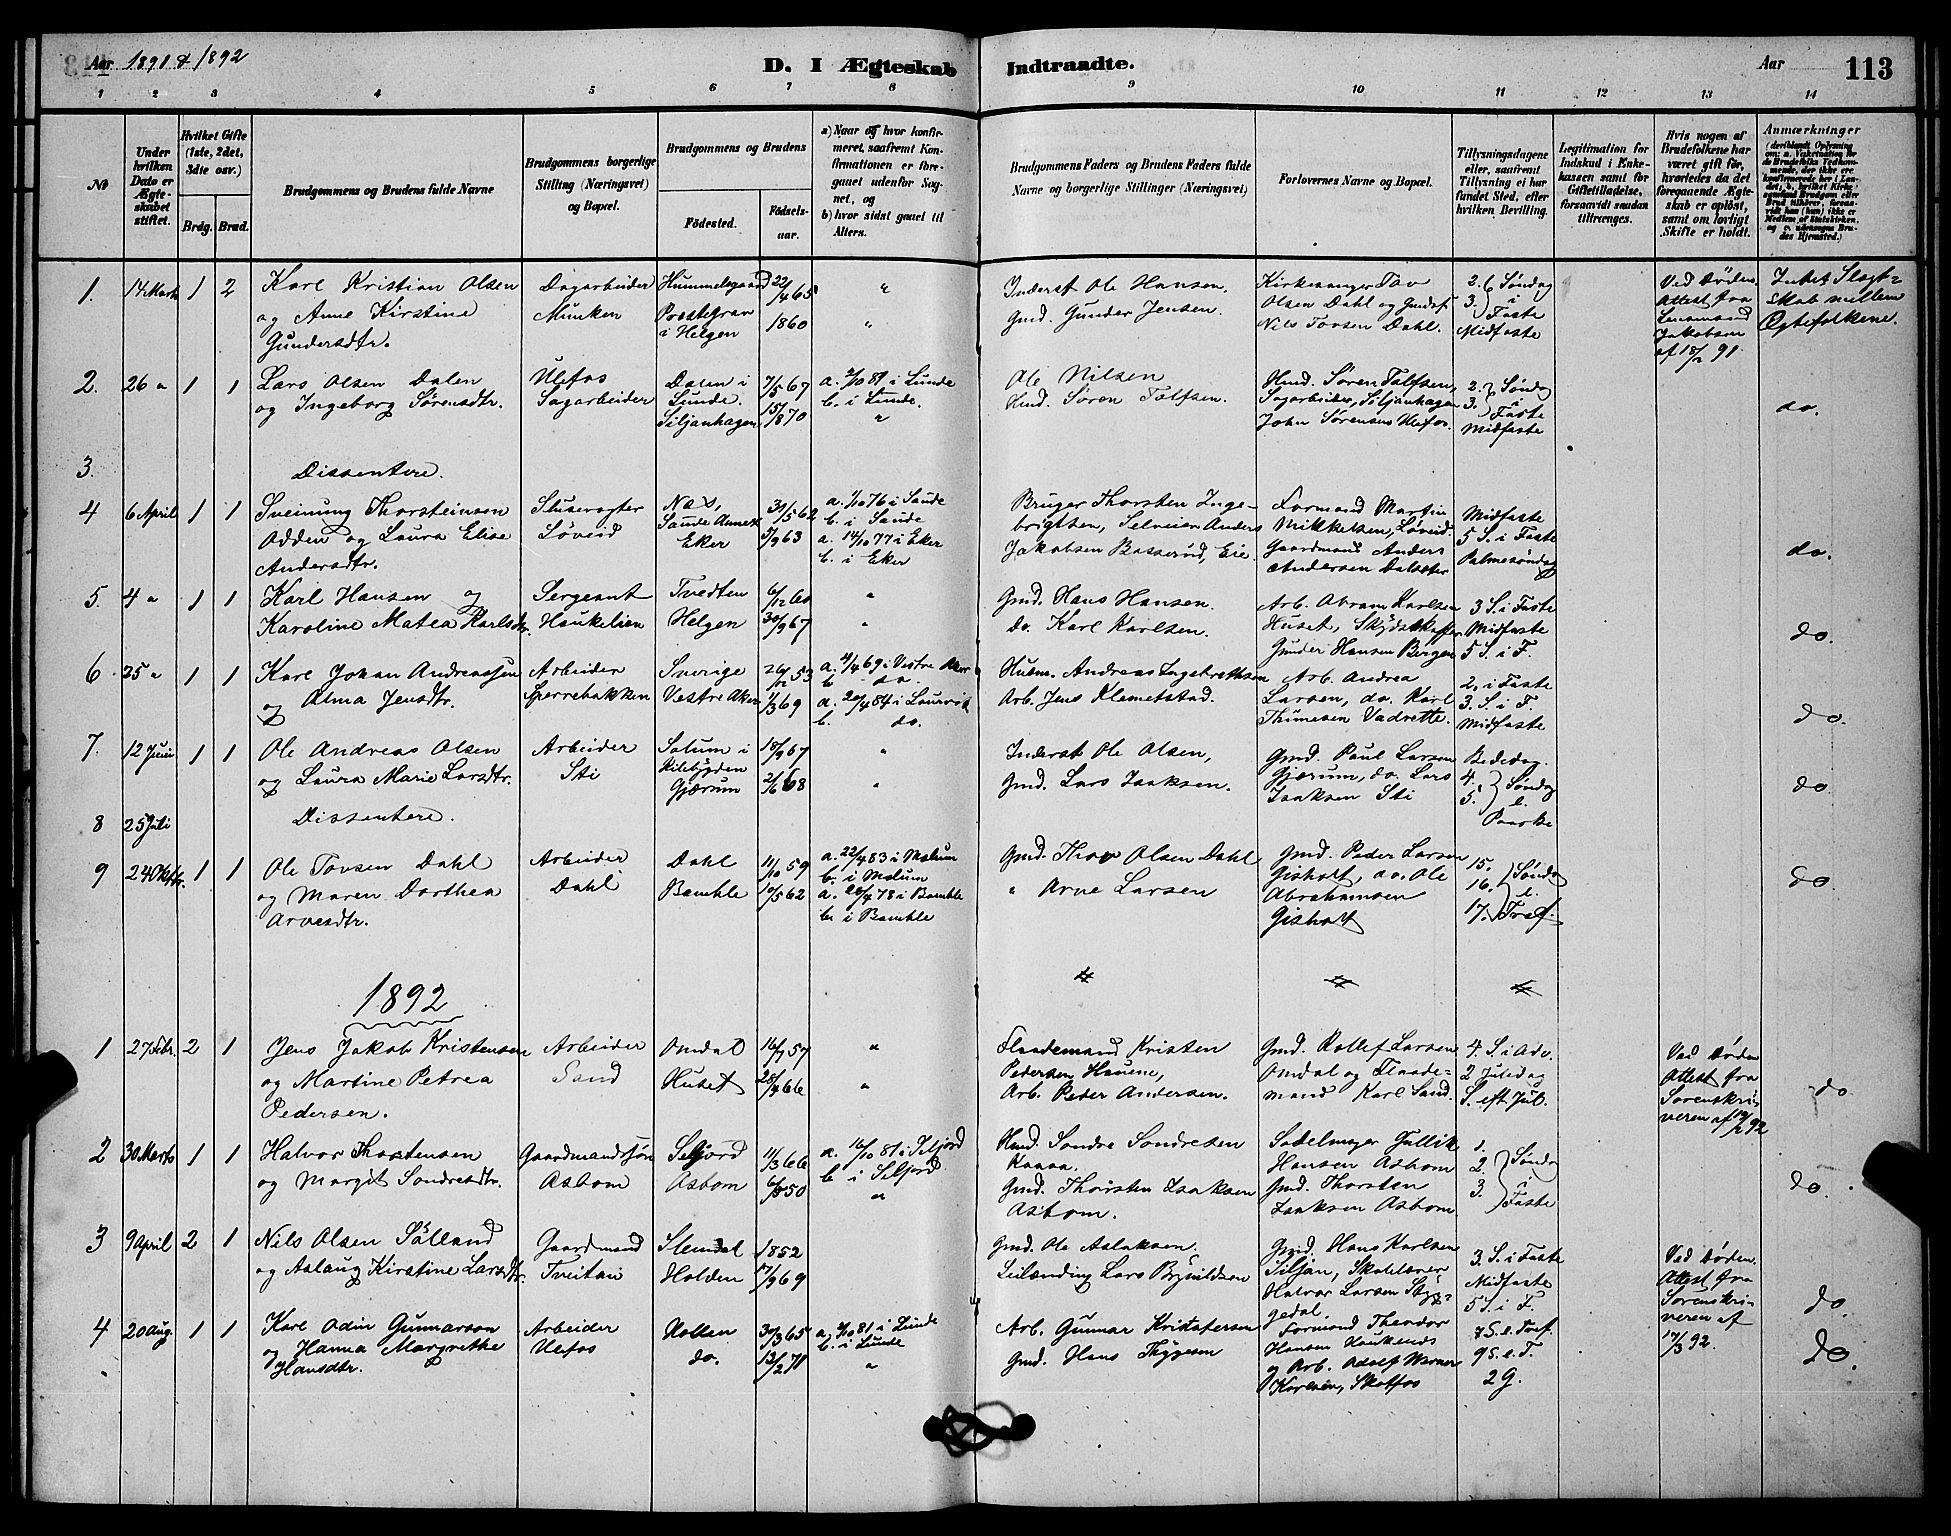 SAKO, Solum kirkebøker, G/Gb/L0003: Klokkerbok nr. II 3, 1880-1898, s. 113